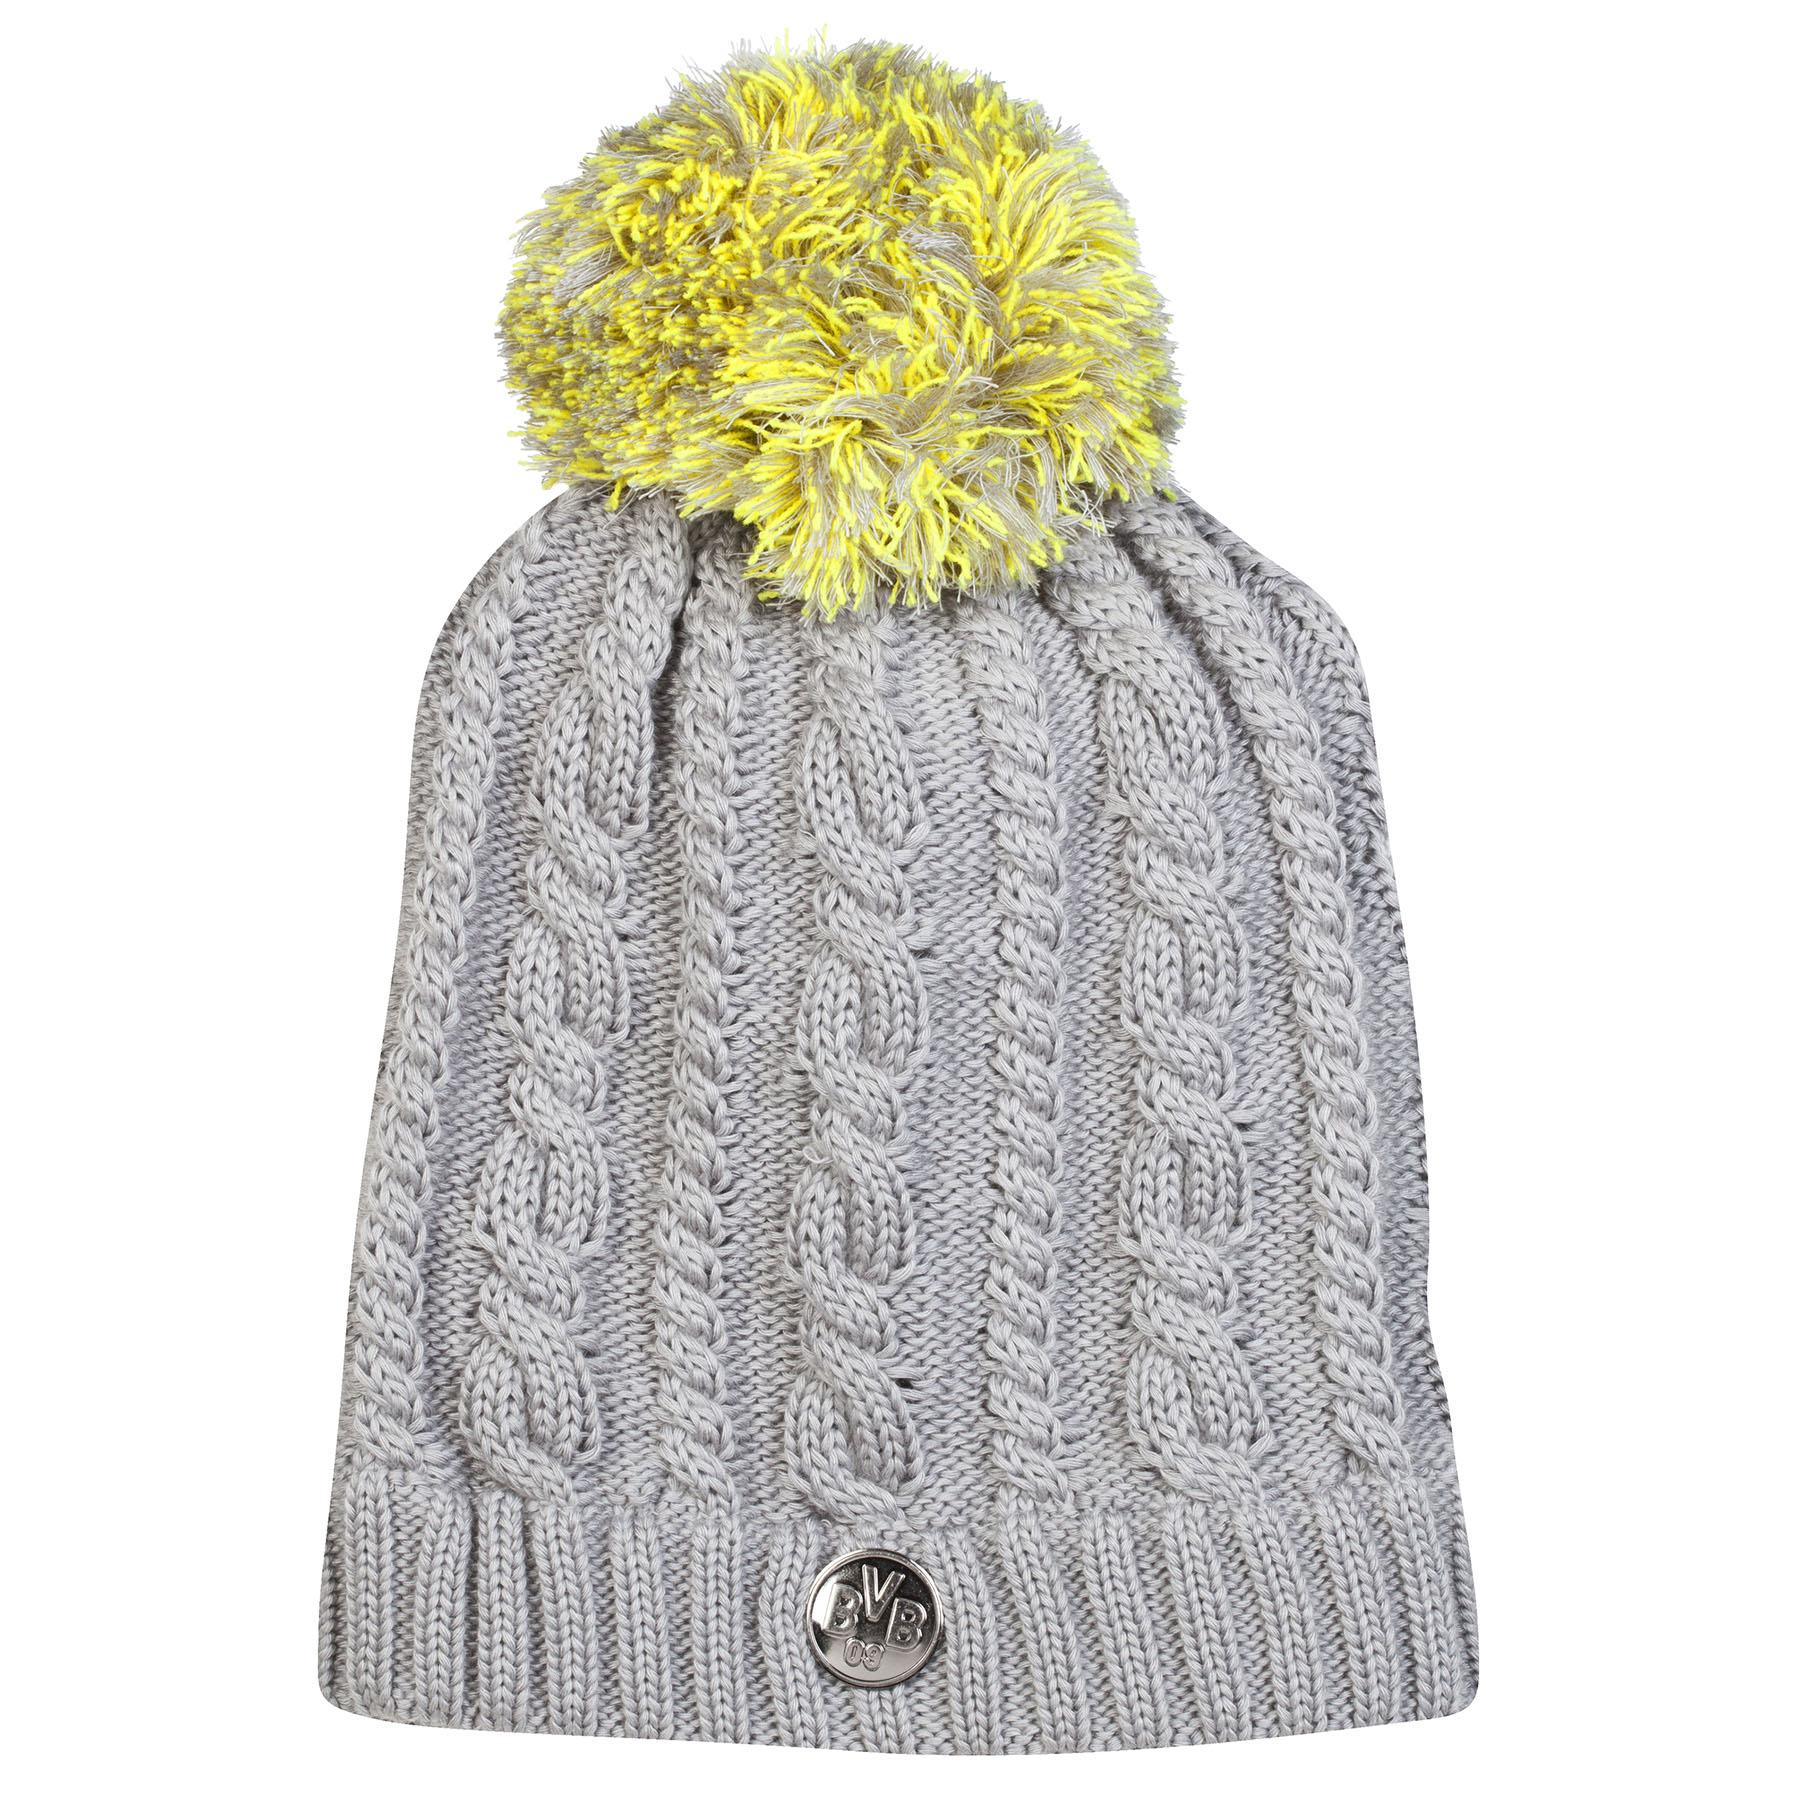 BVB Bobble Beanie Hat – Grey